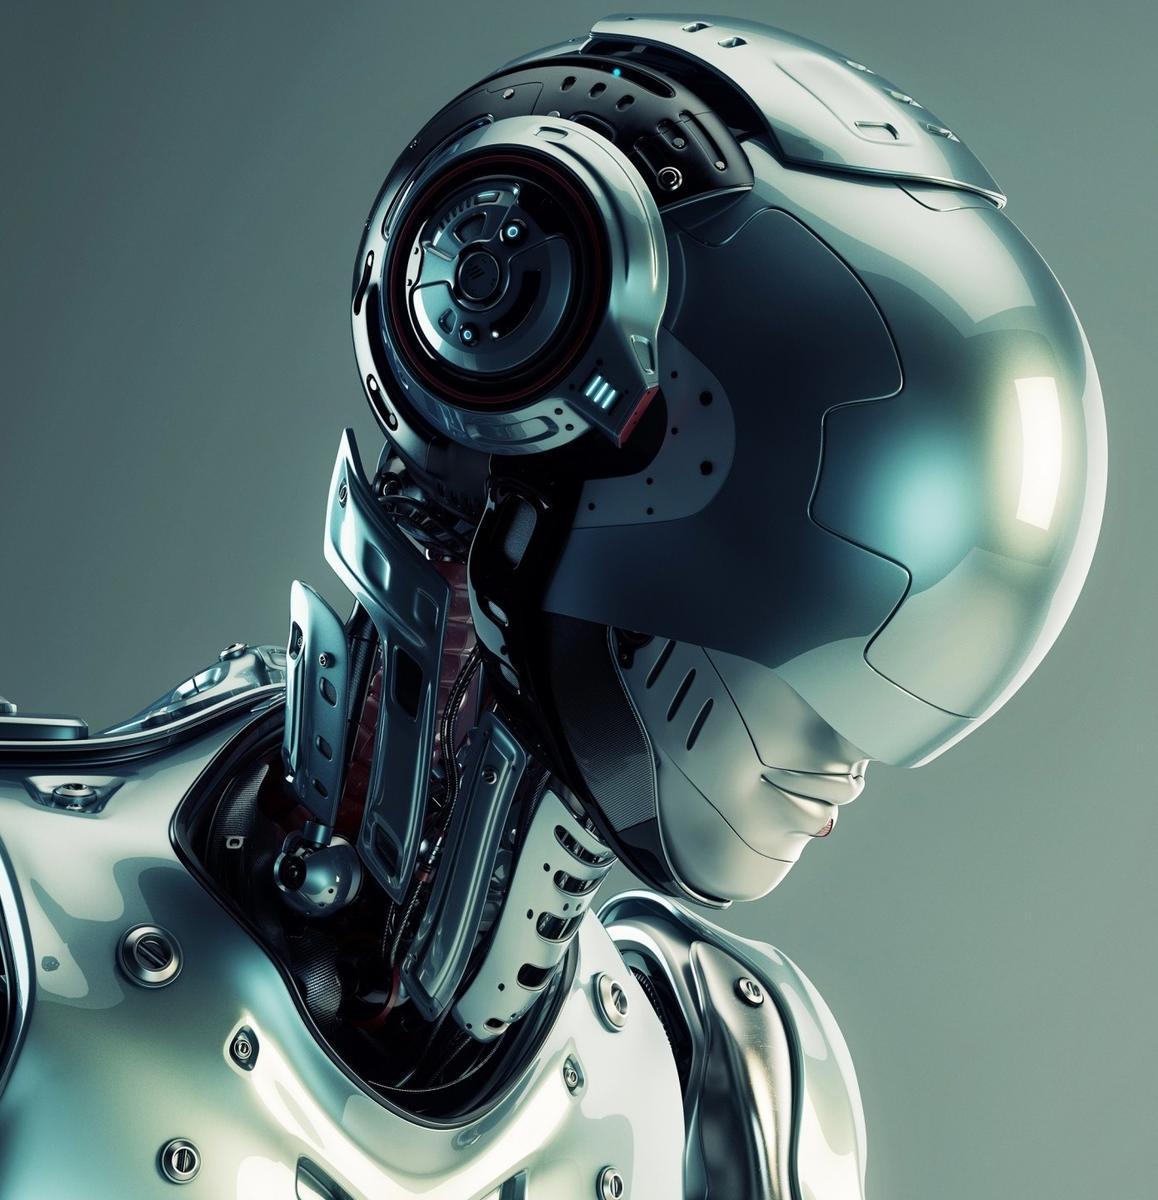 312512-digital_art-robot-3D-technology-futuristic-science_fiction-metal-simple_background-screw-CGI~3.jpg